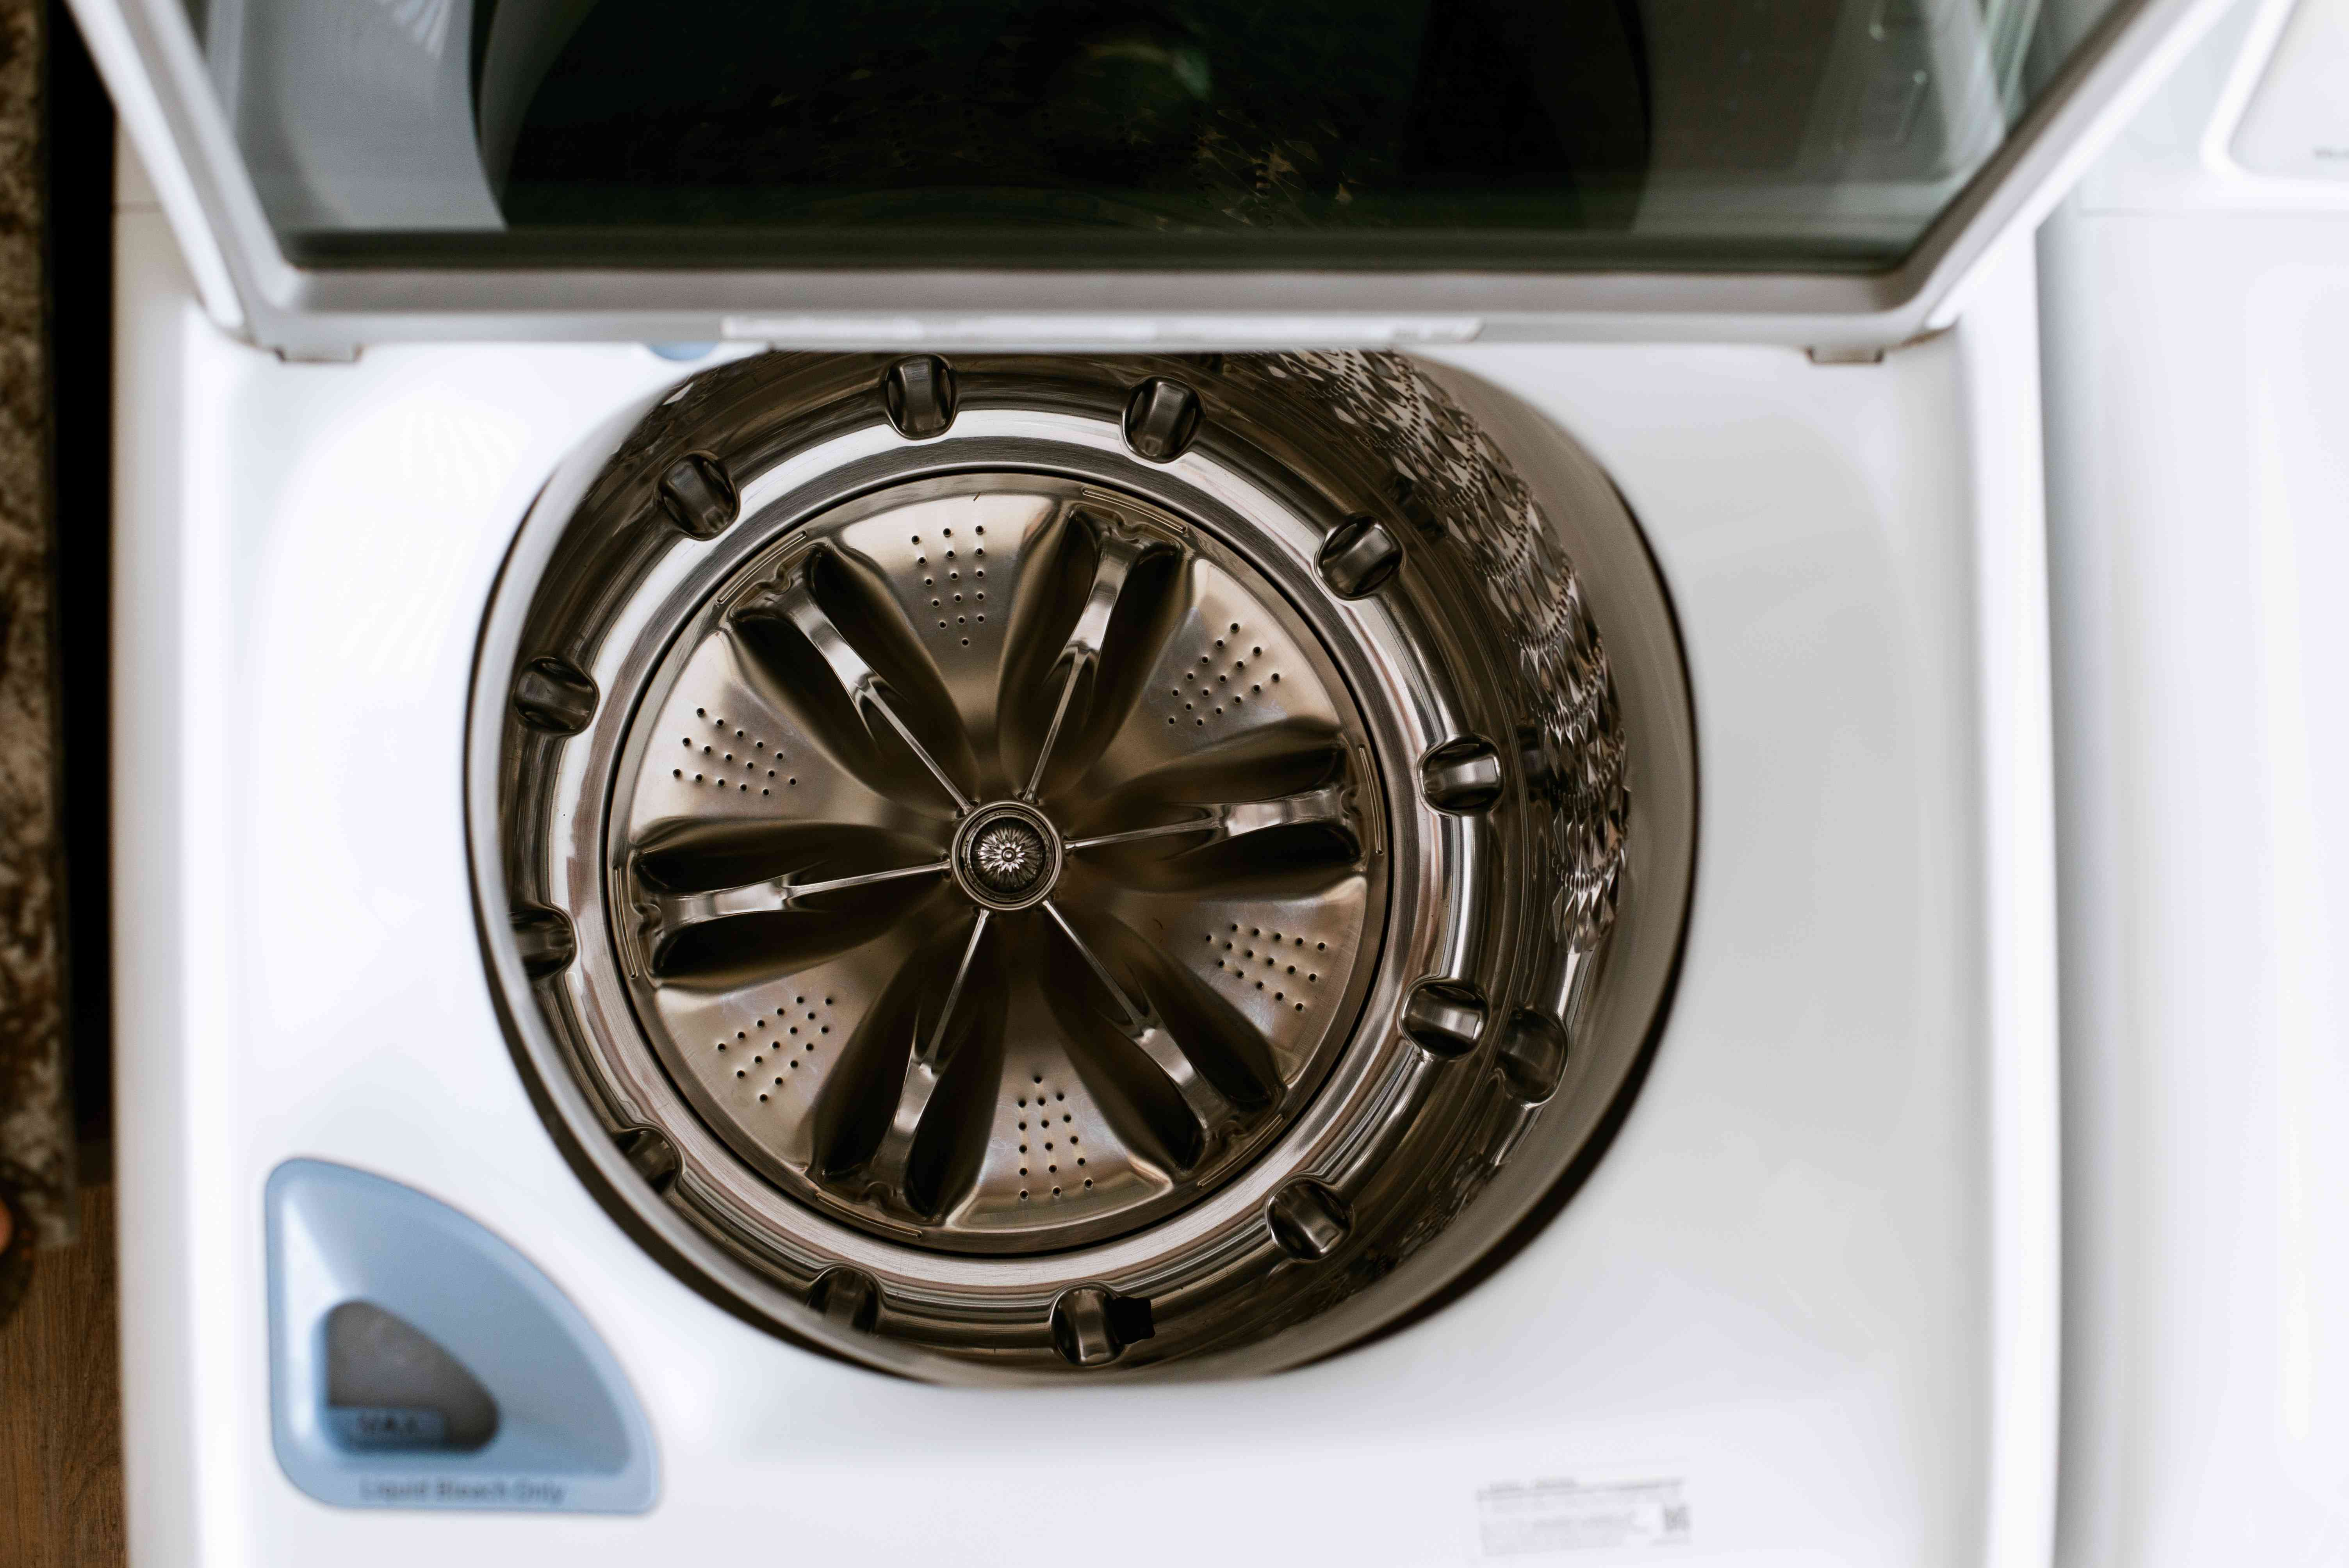 Top-loading washing machine with door open